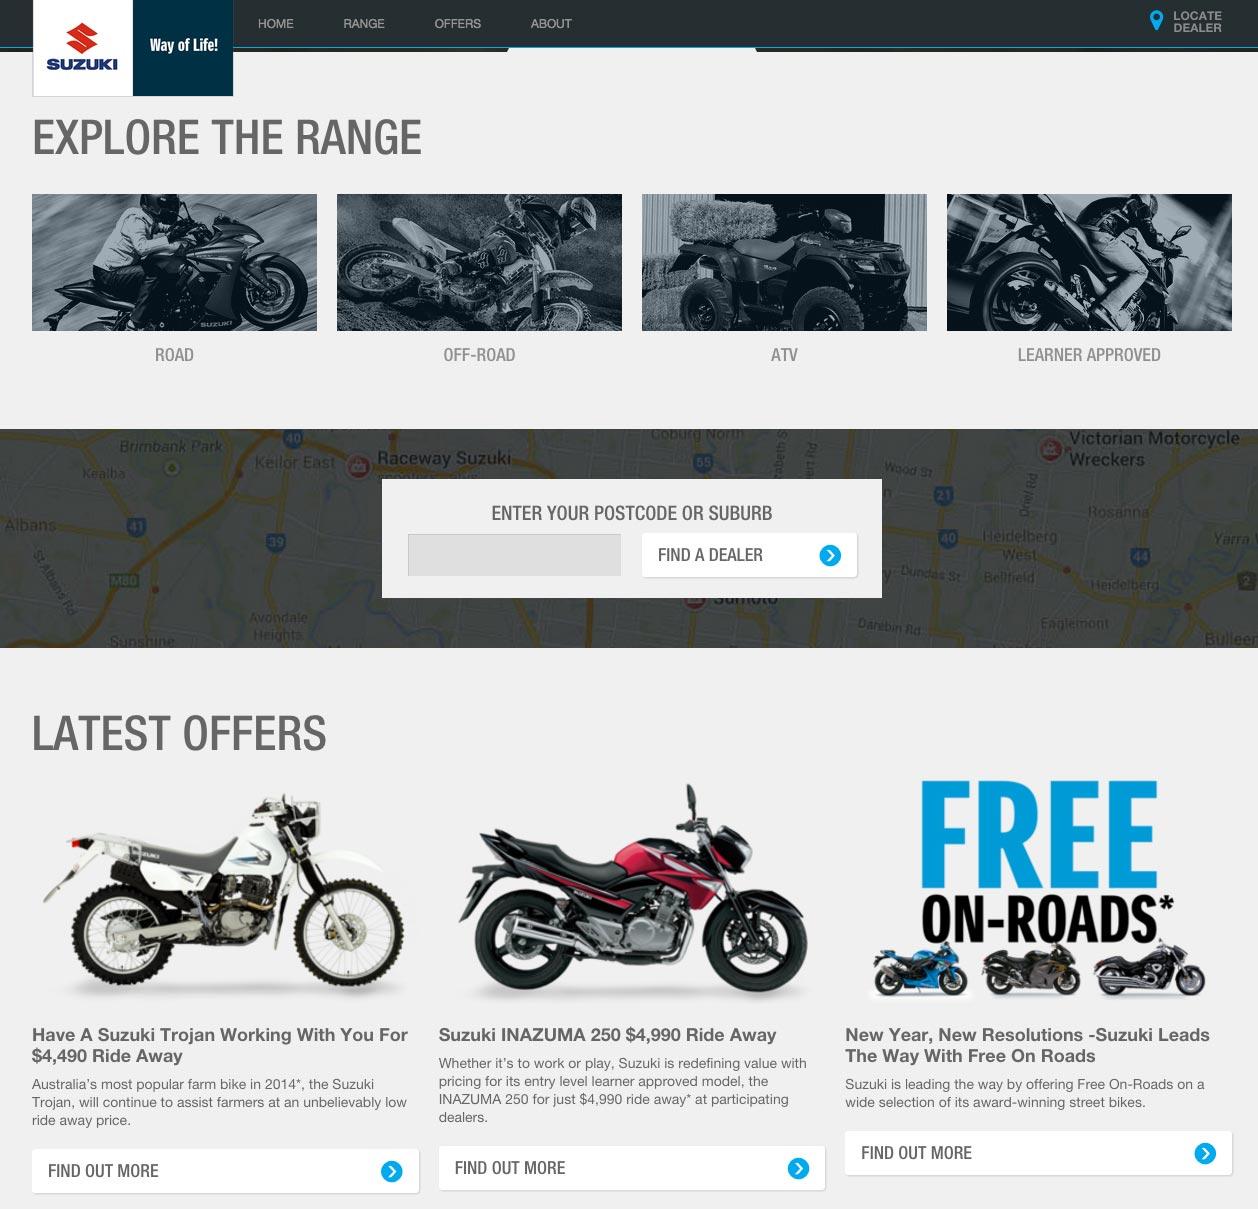 Suzuki Motorcycles Australia Launches New Website